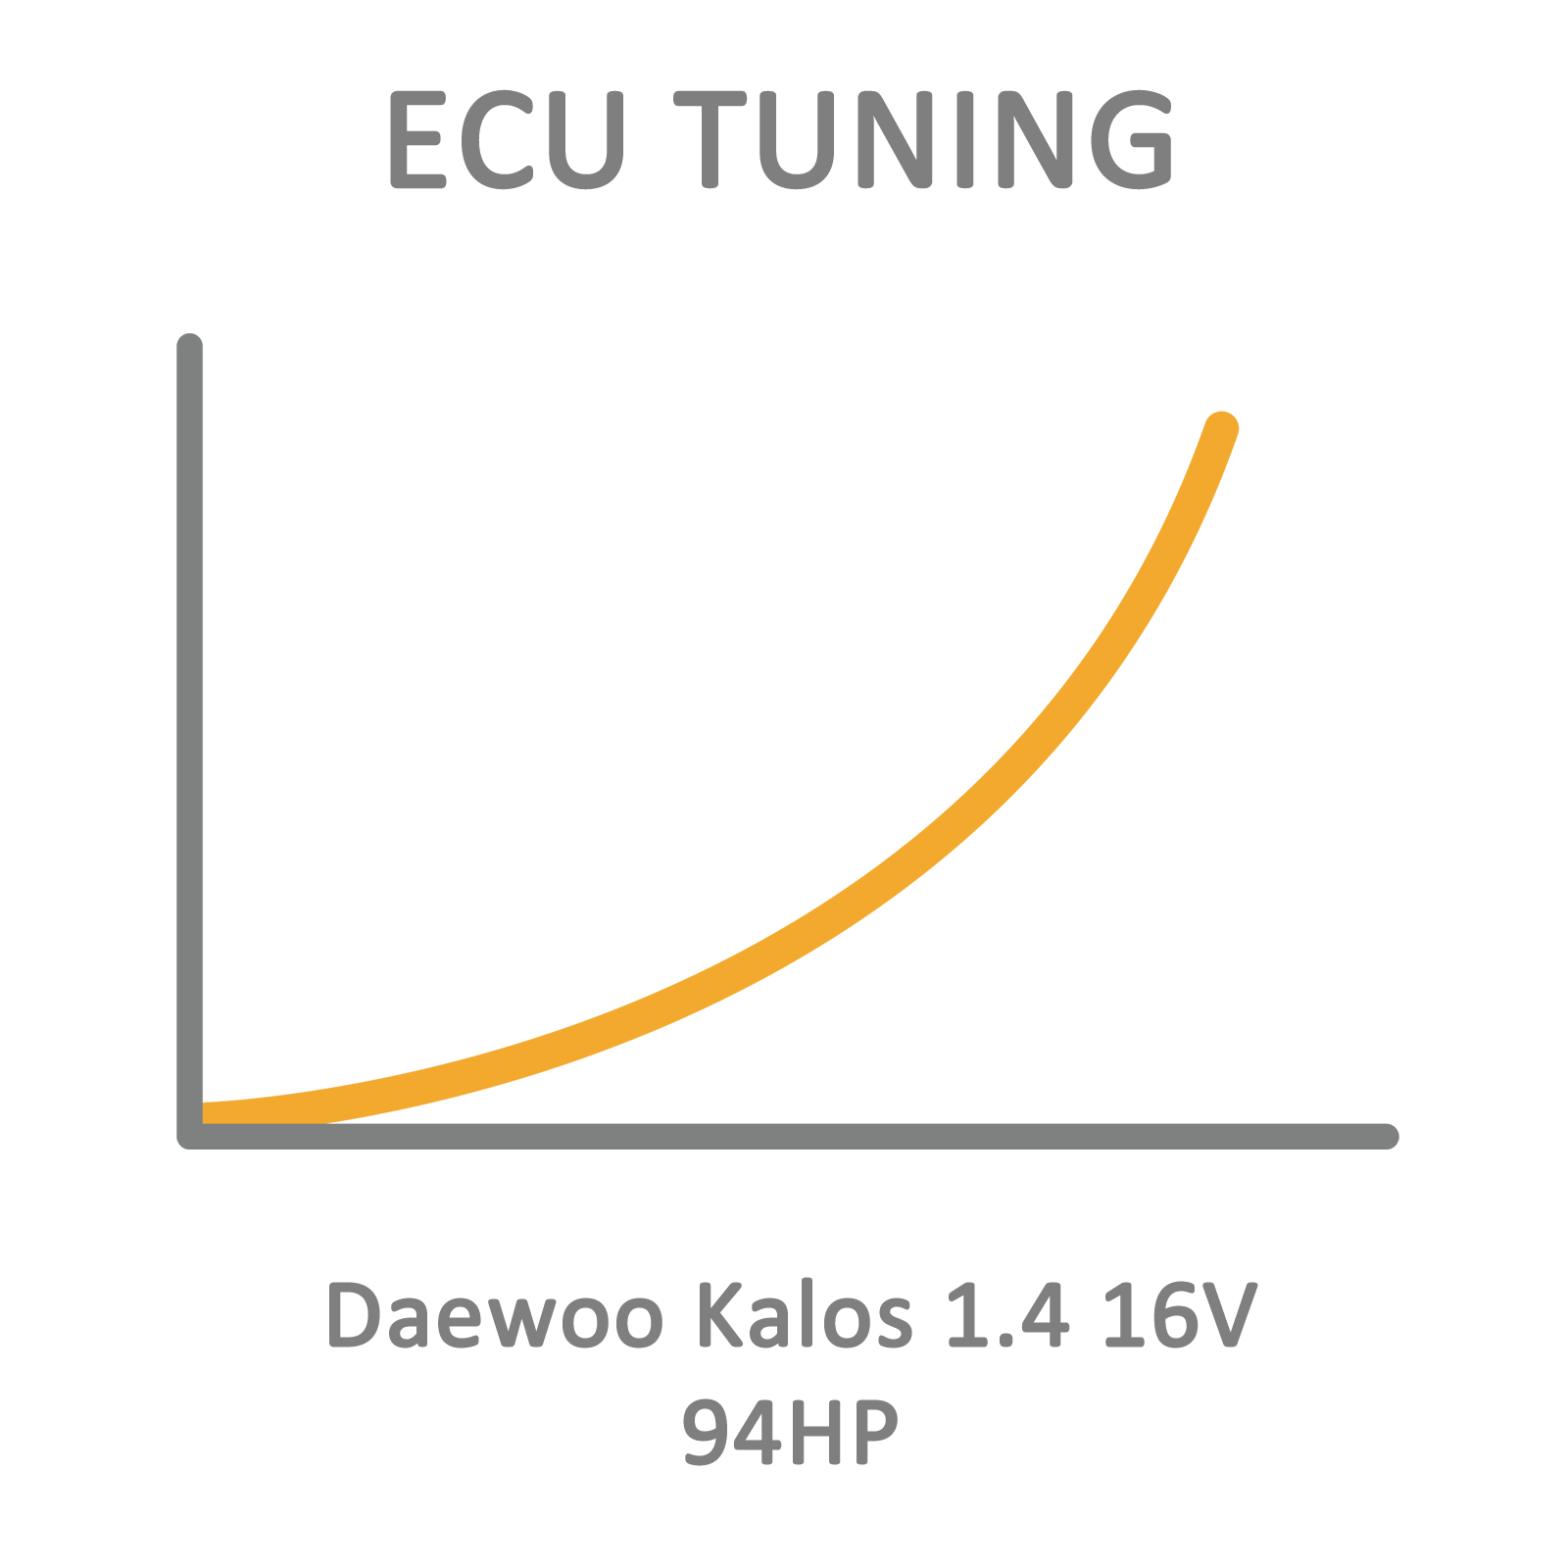 Daewoo Kalos 1.4 16V 94HP ECU Tuning Remapping Programming